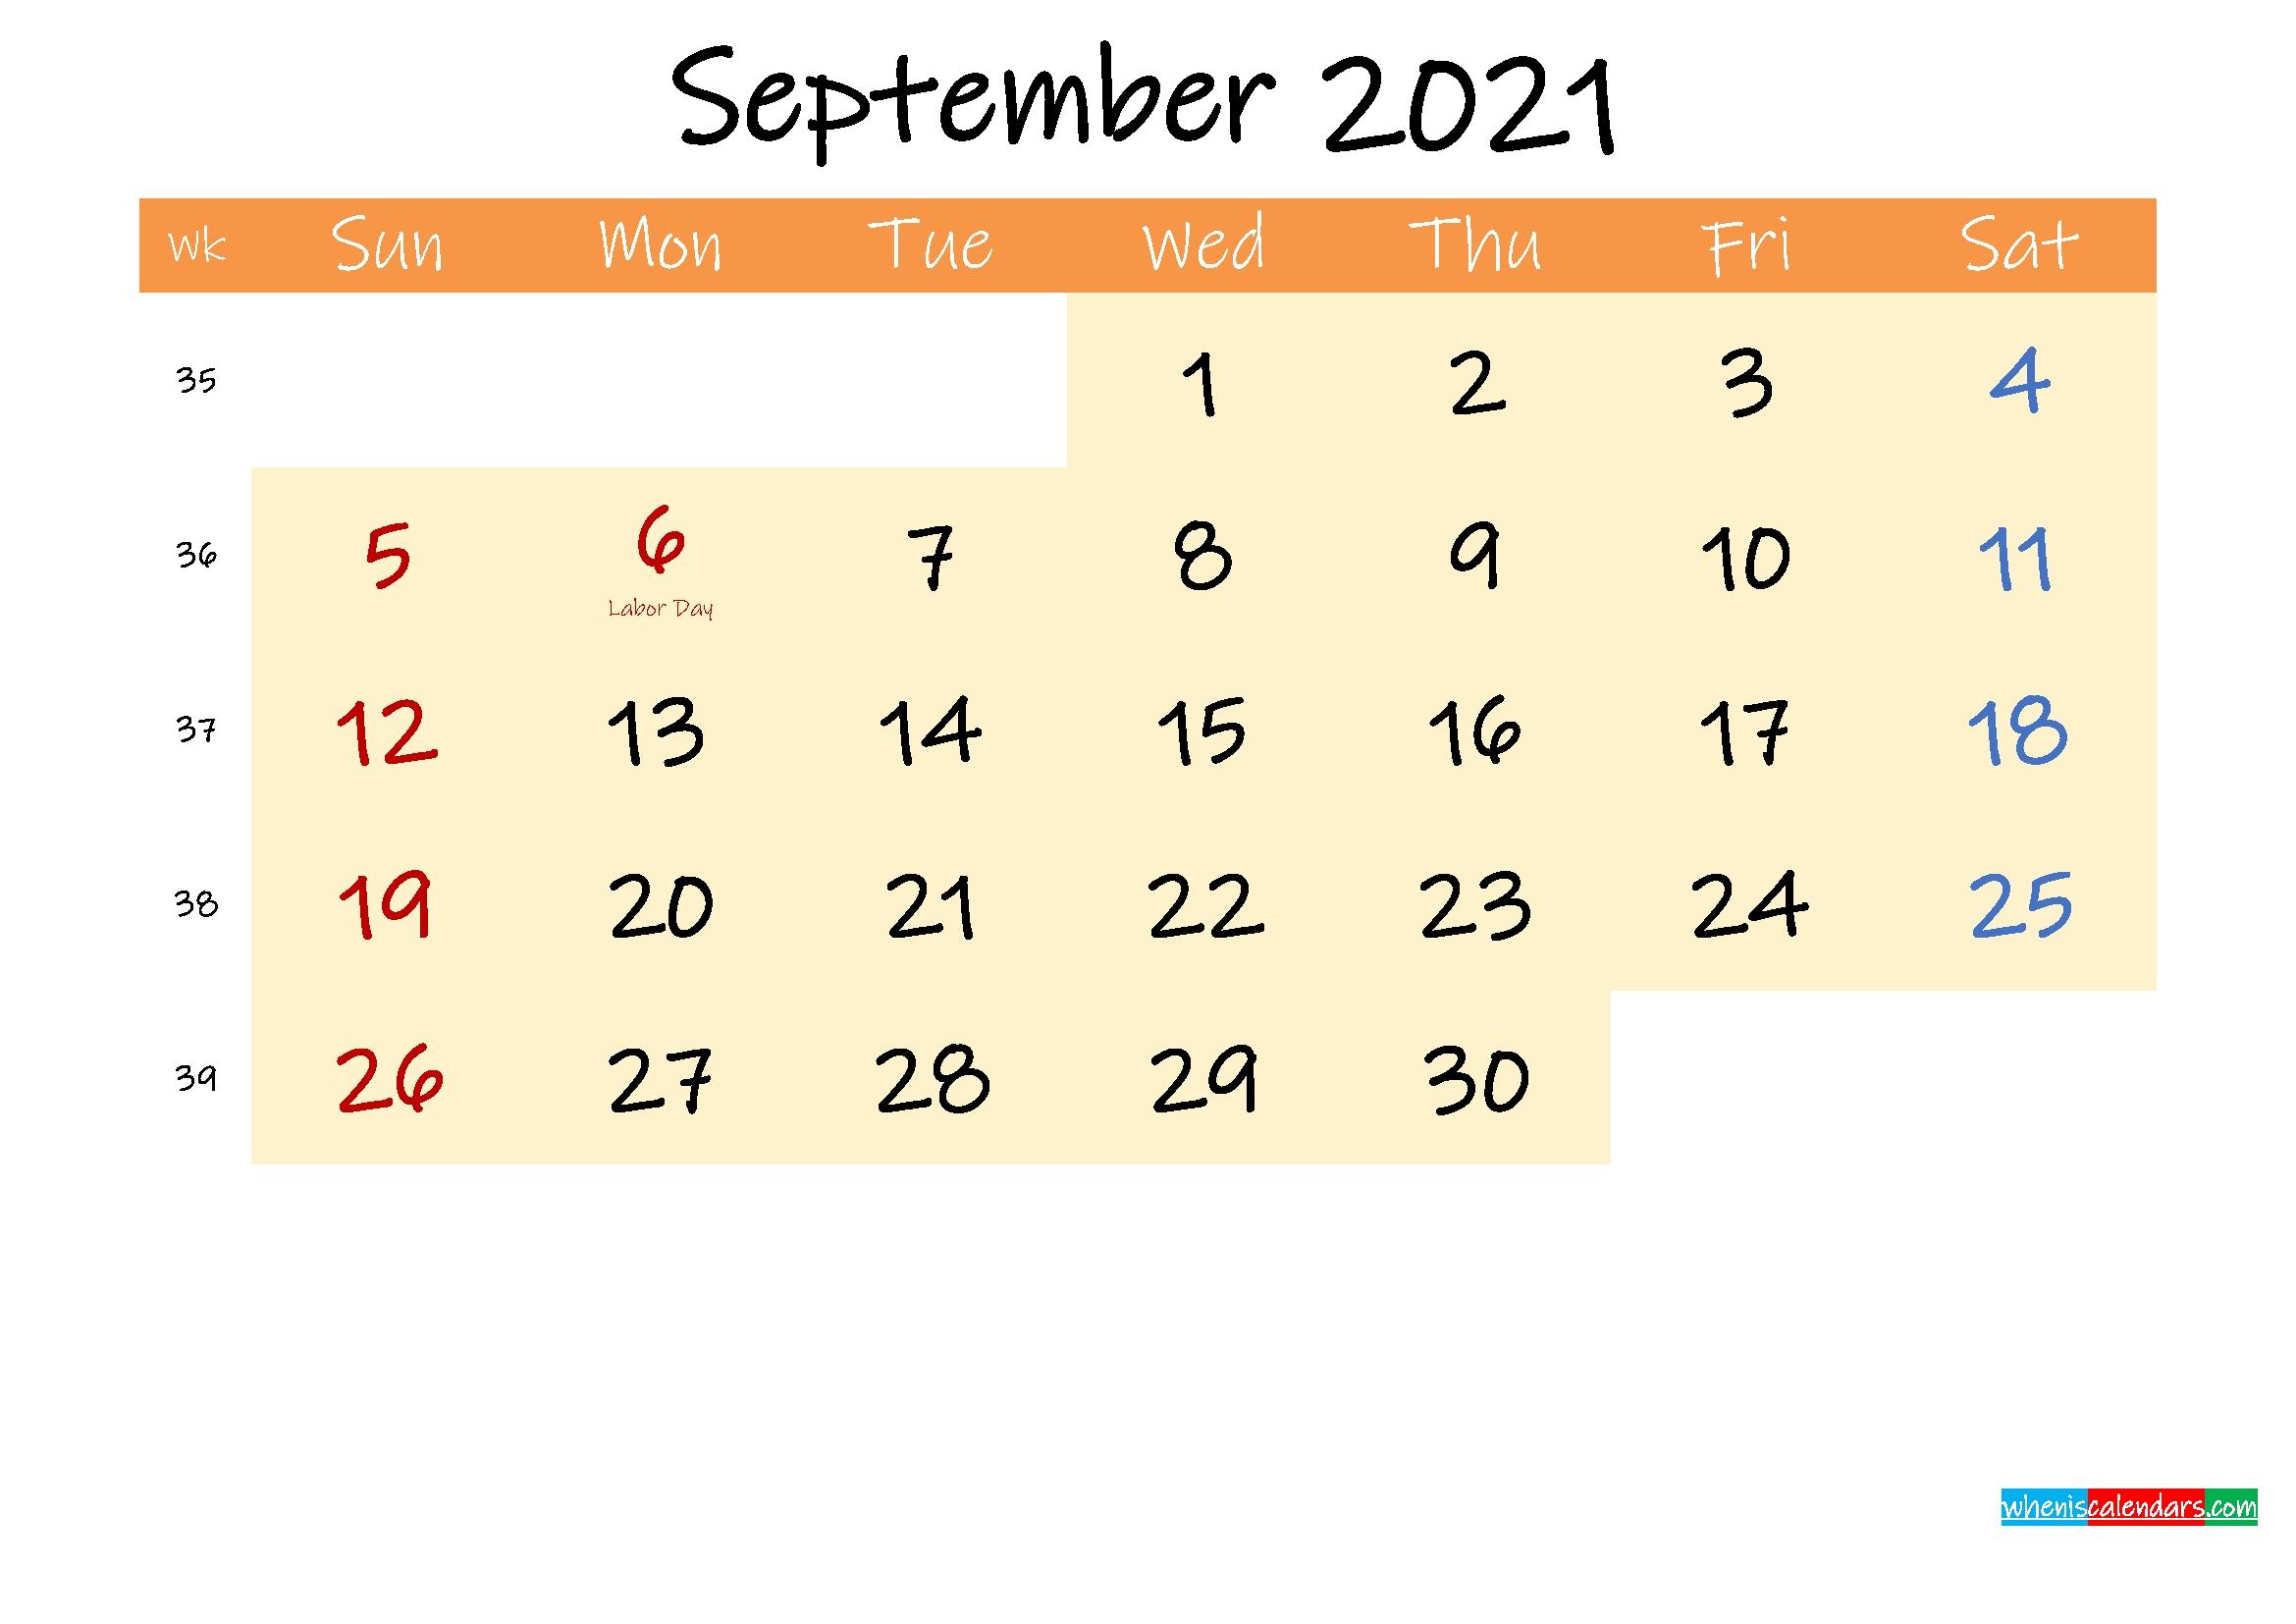 September 2021 Calendar Printable Template | Calendar Printables Free Blank Printable Calendar September 2020 To September 2021